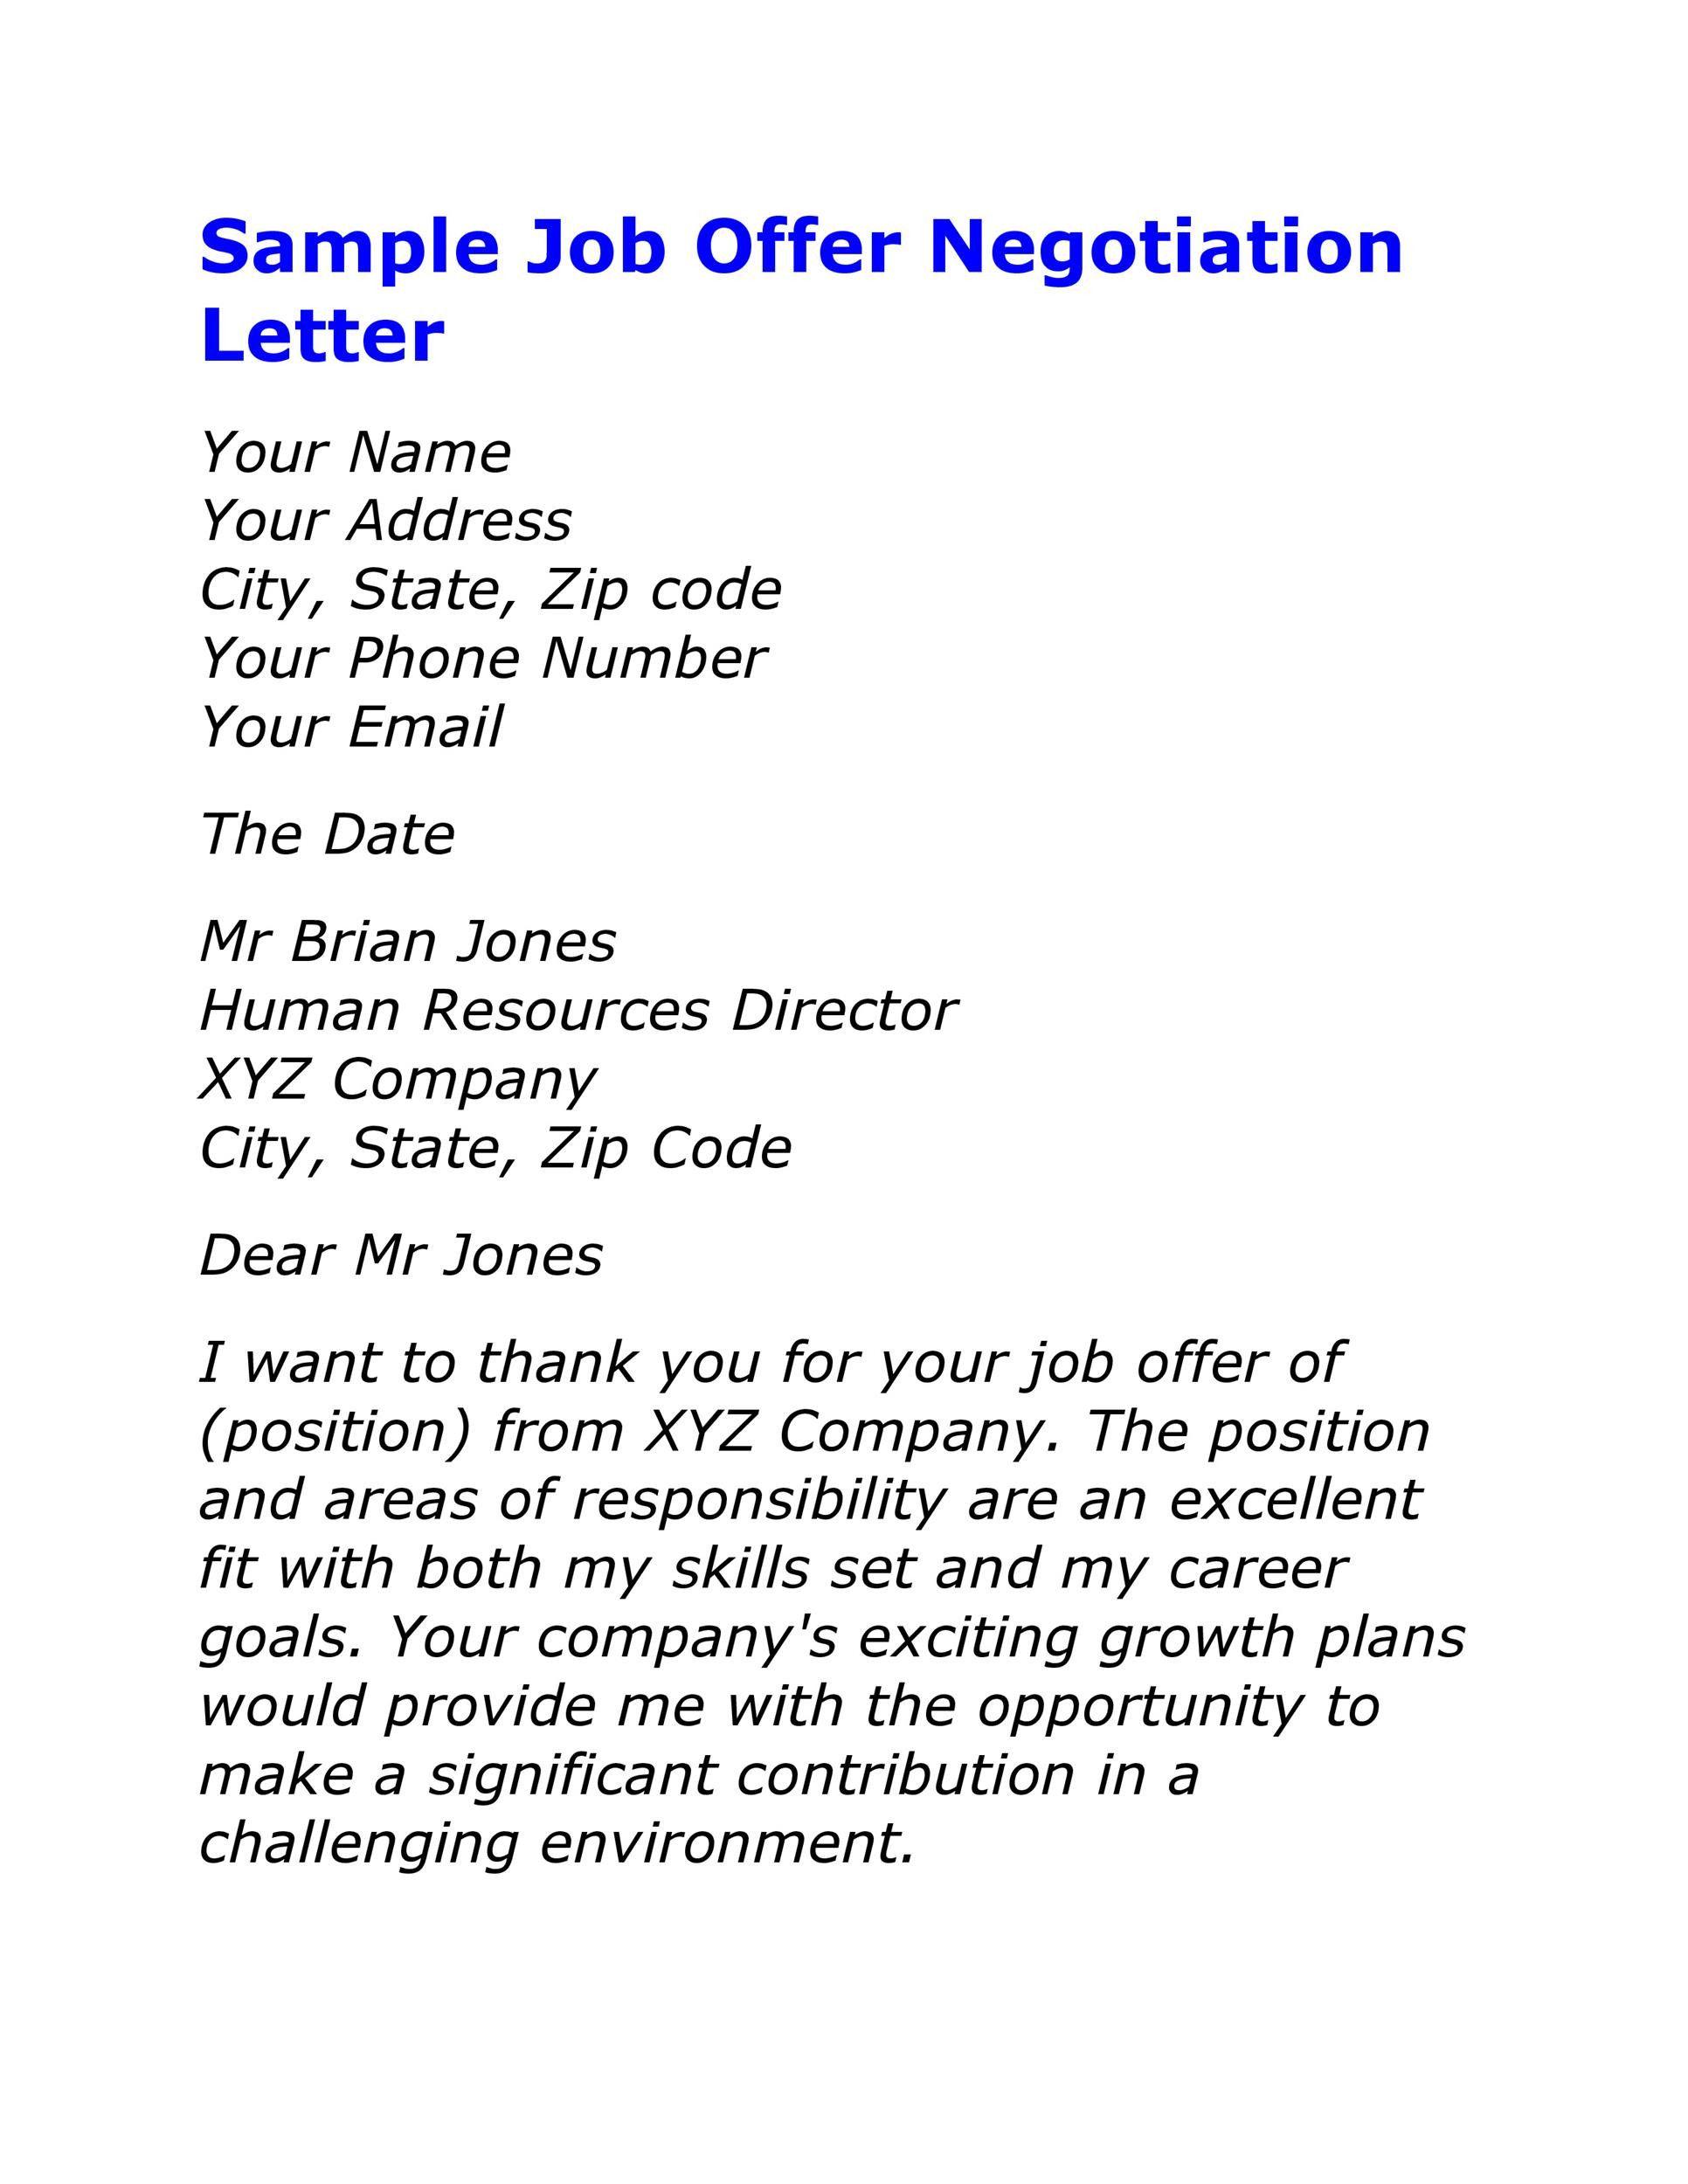 Job Offer Negotiation Letter Sample in 2020 Lettering